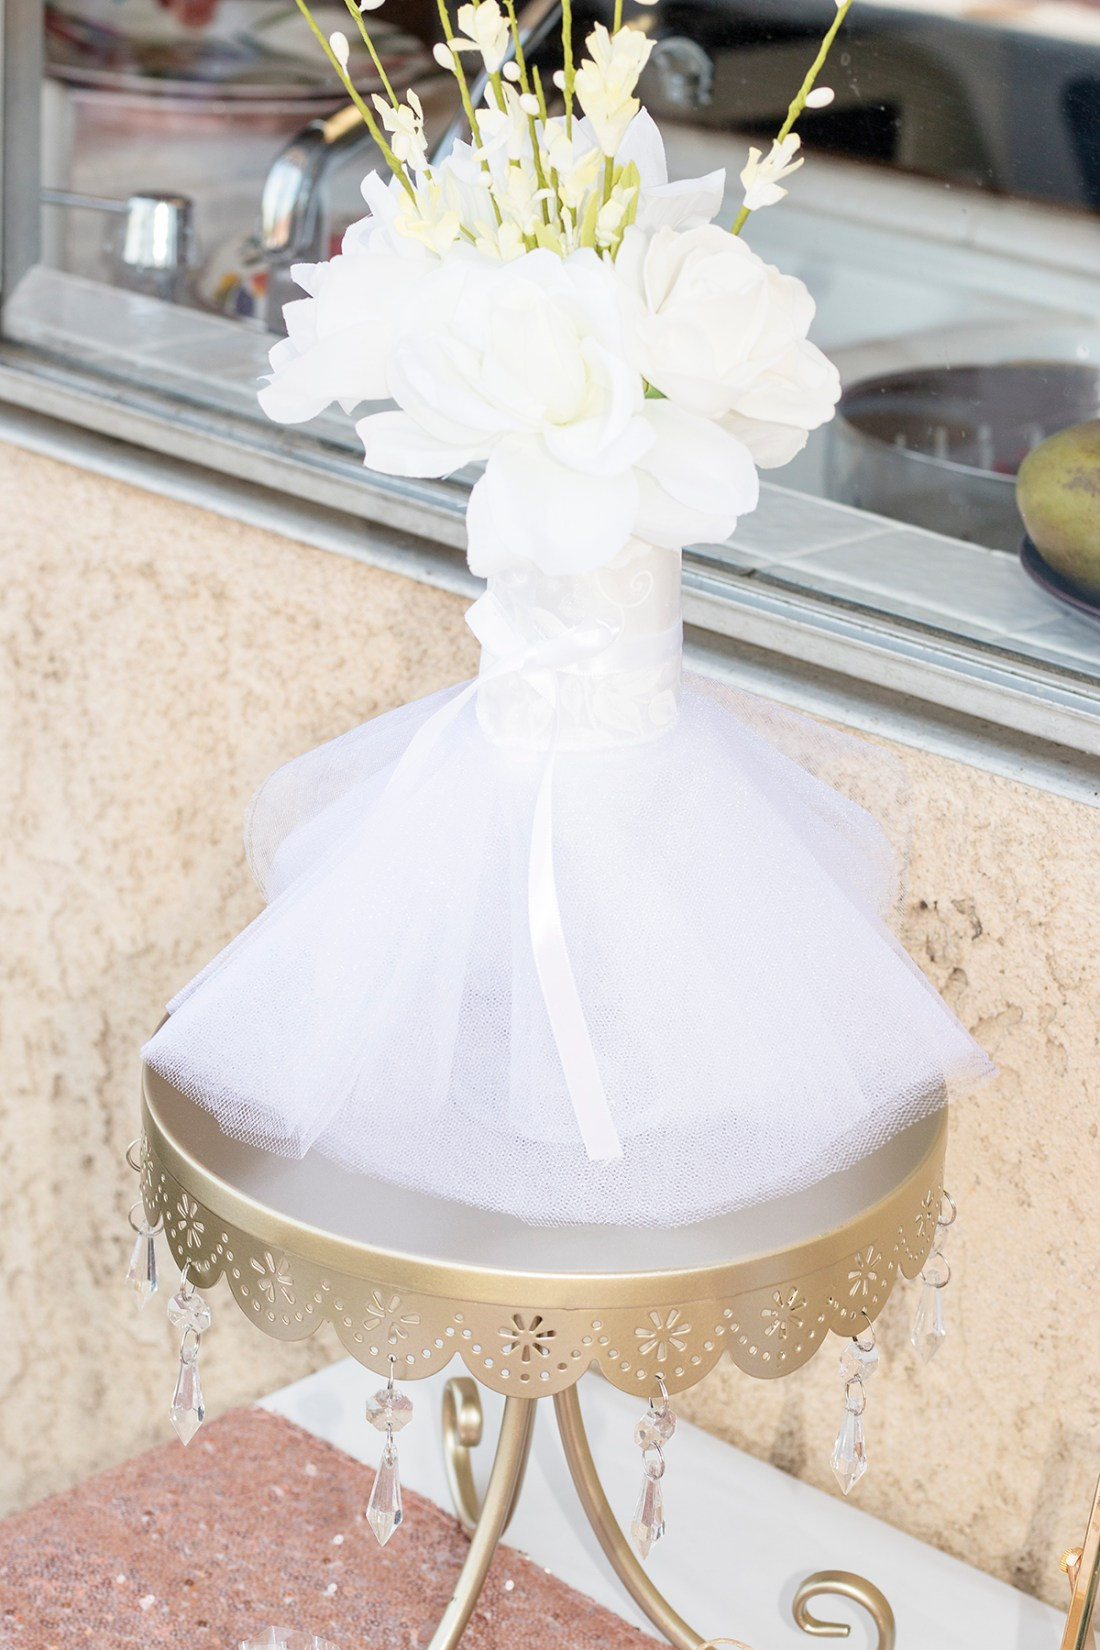 Rosé and Bubbly Bridal Shower Floral Centerpiece | A Good Hue